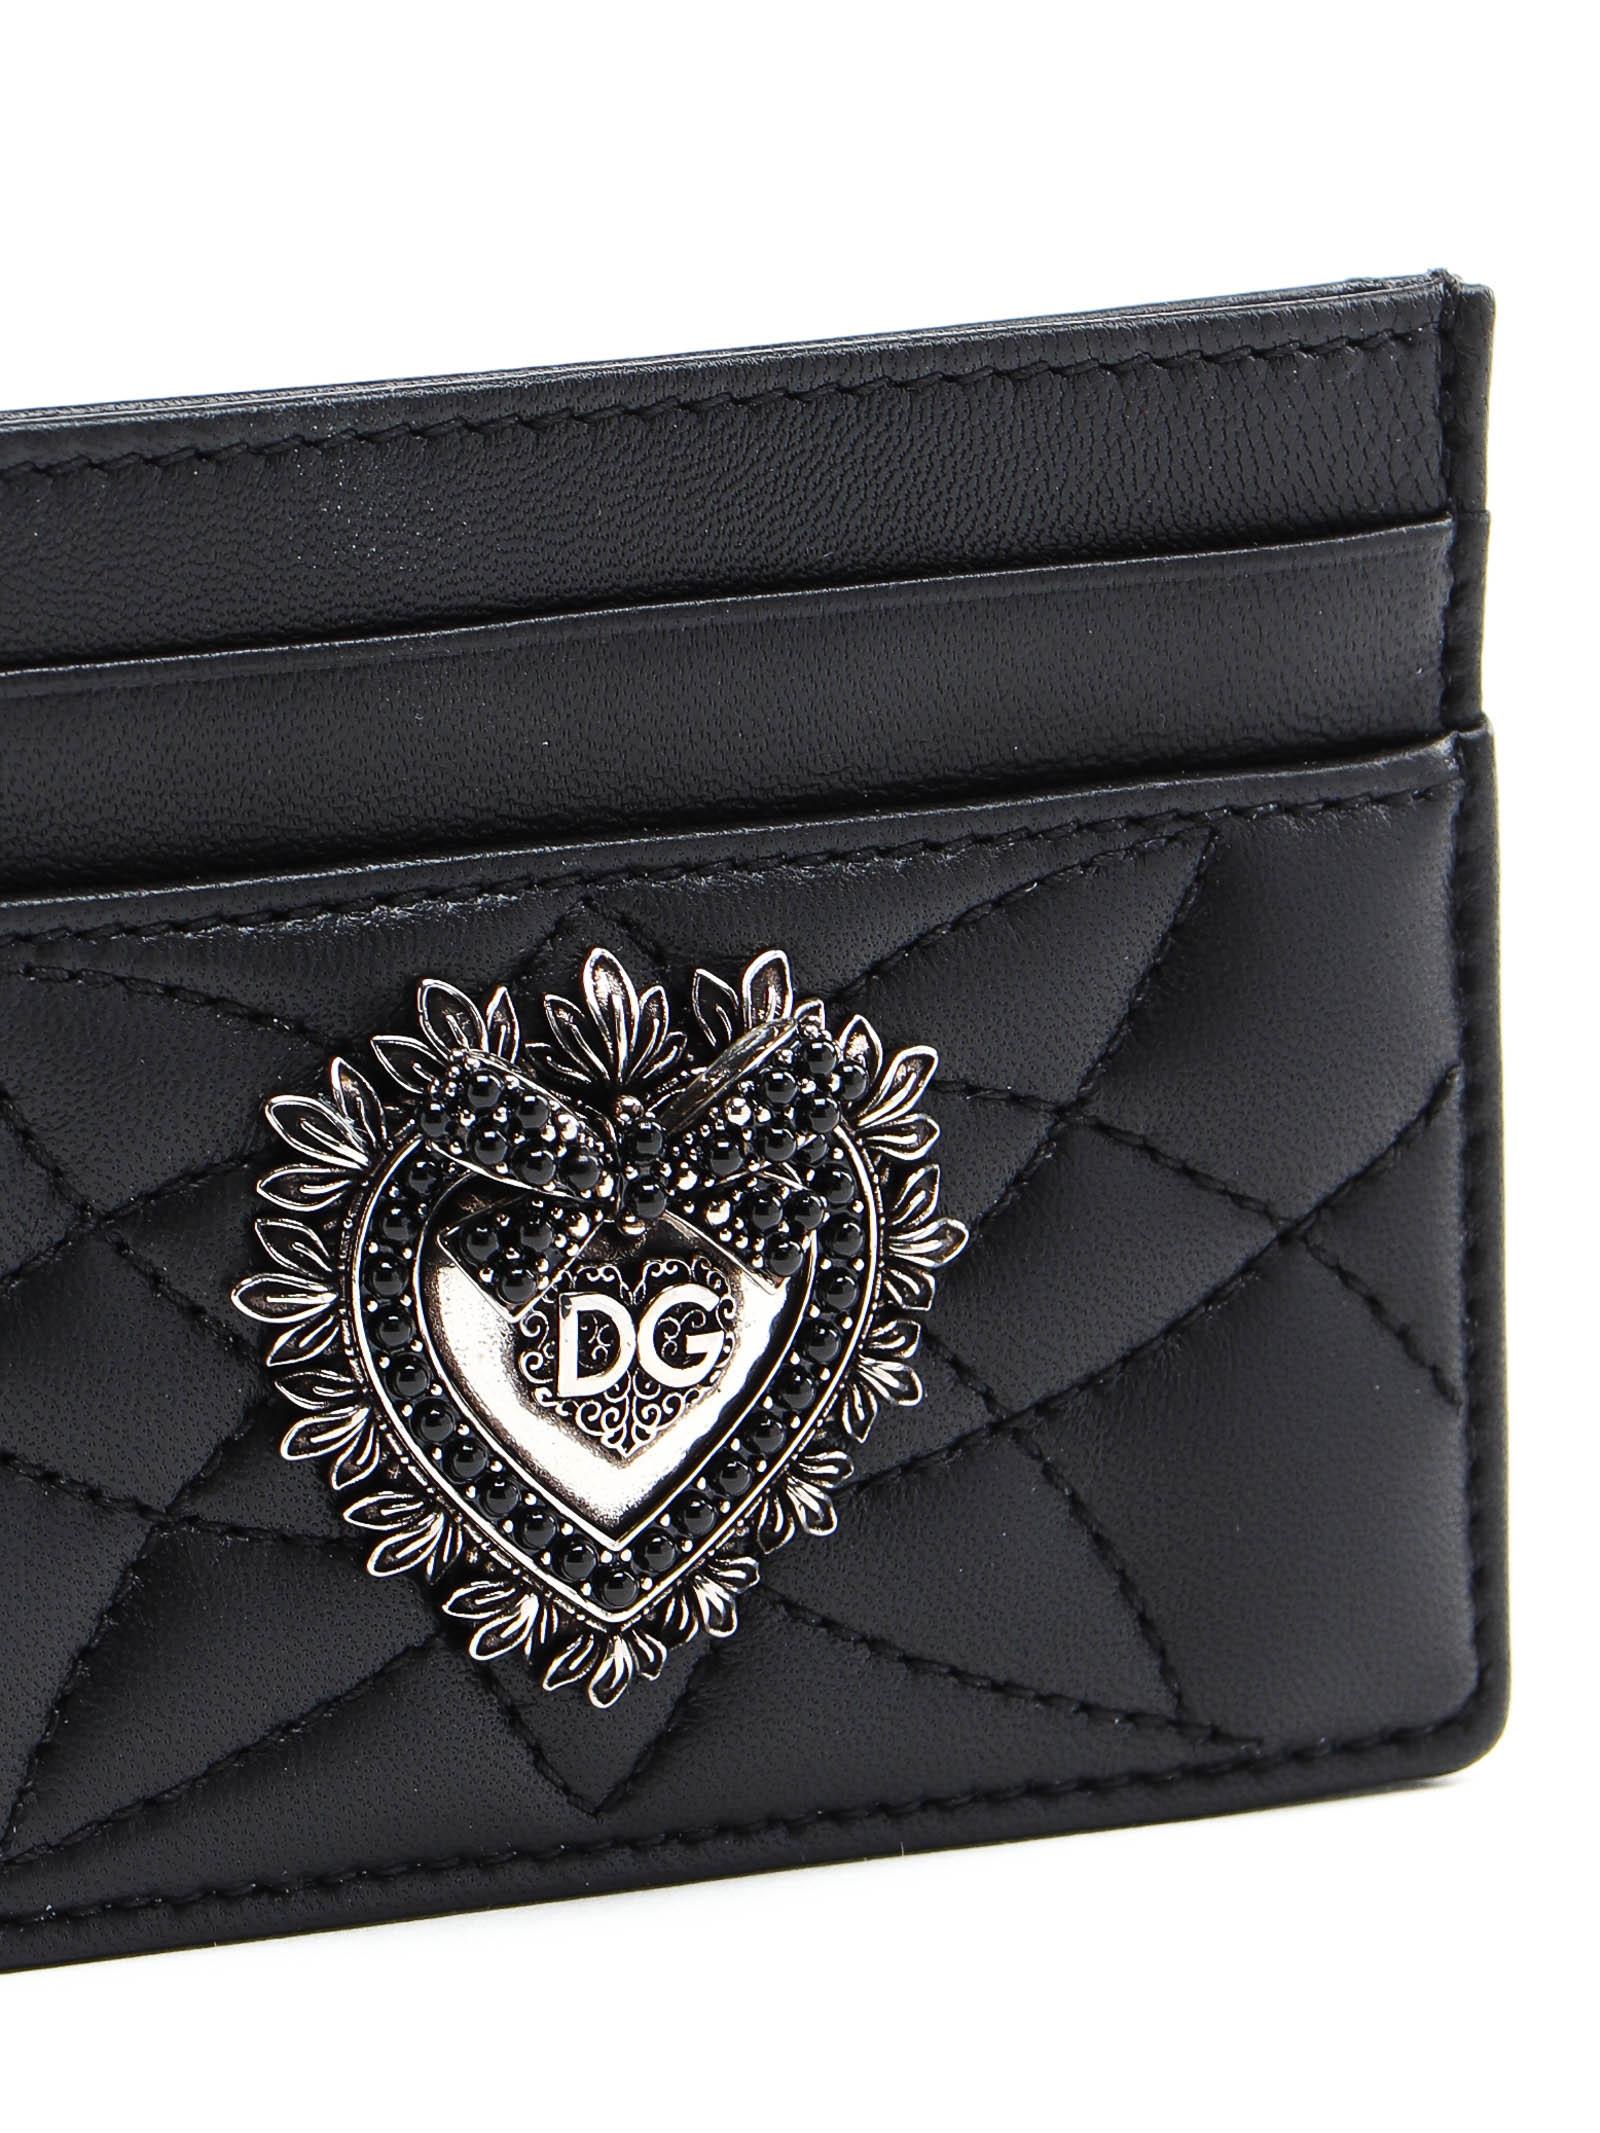 Picture of Dolce Gabbana | Devotion Card Case